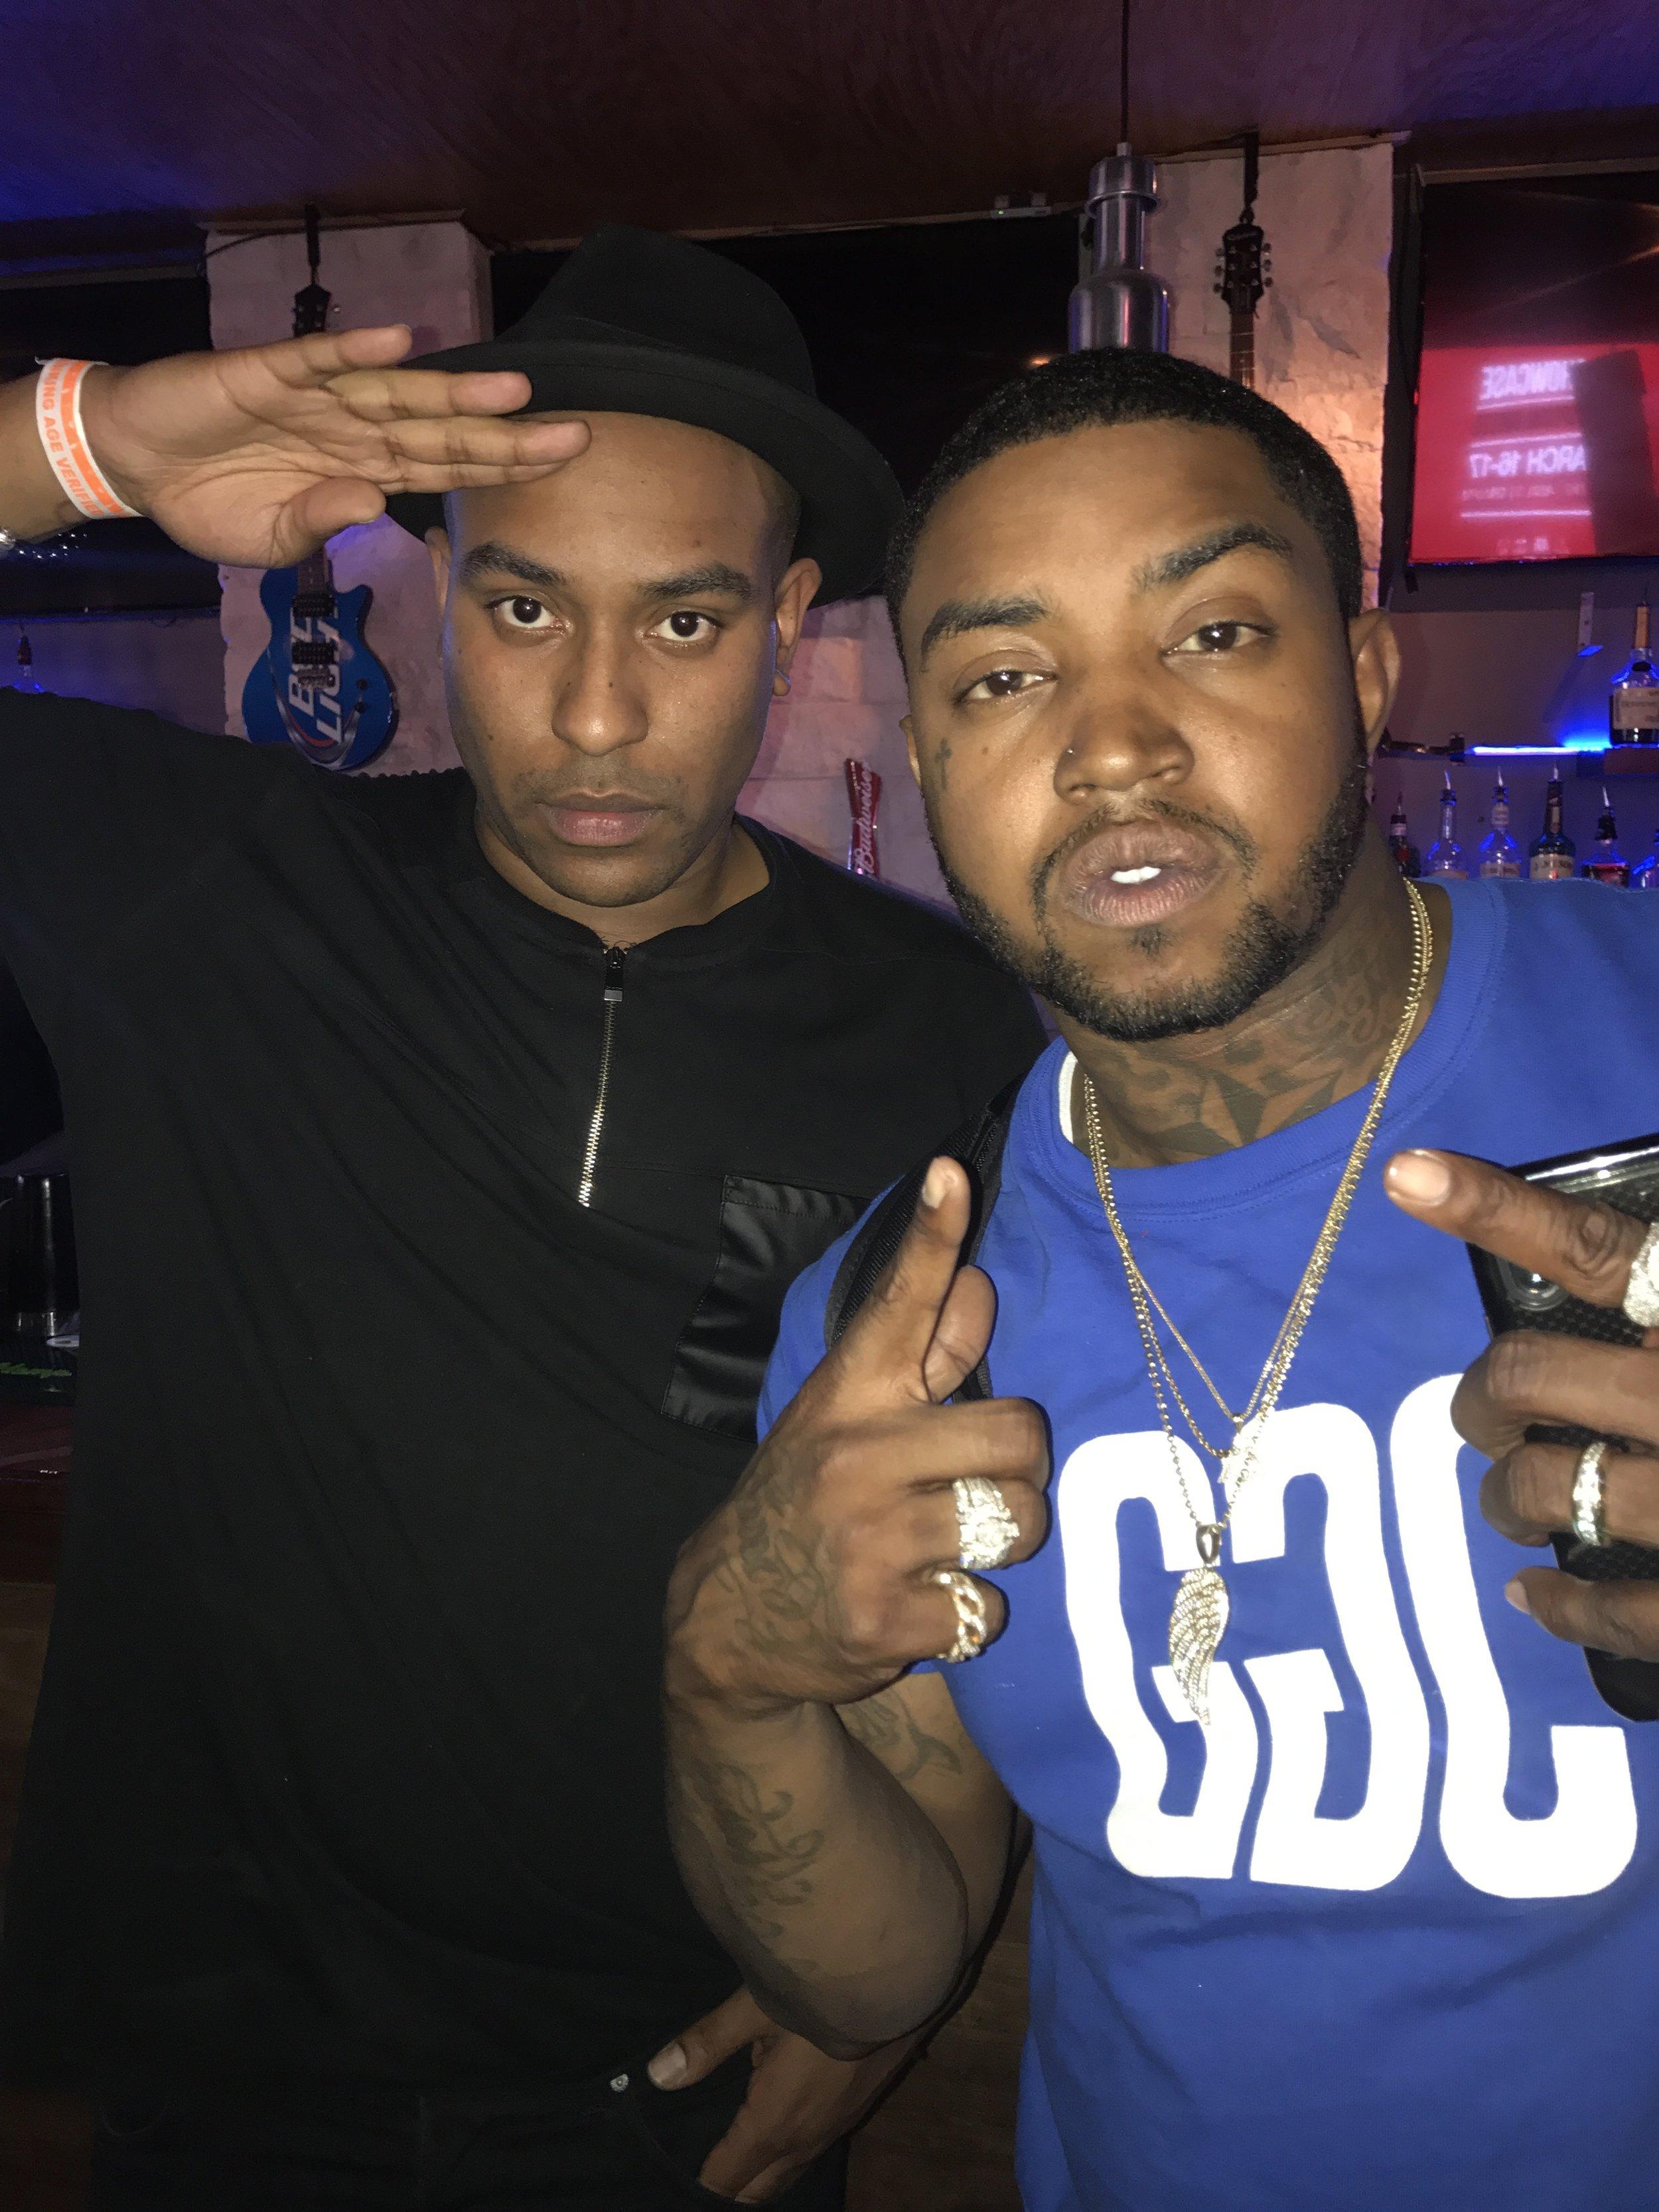 Paul Lewis Magic Music Management Lil Scrappy Love and Hip Hop Atlanta SXSW.JPG